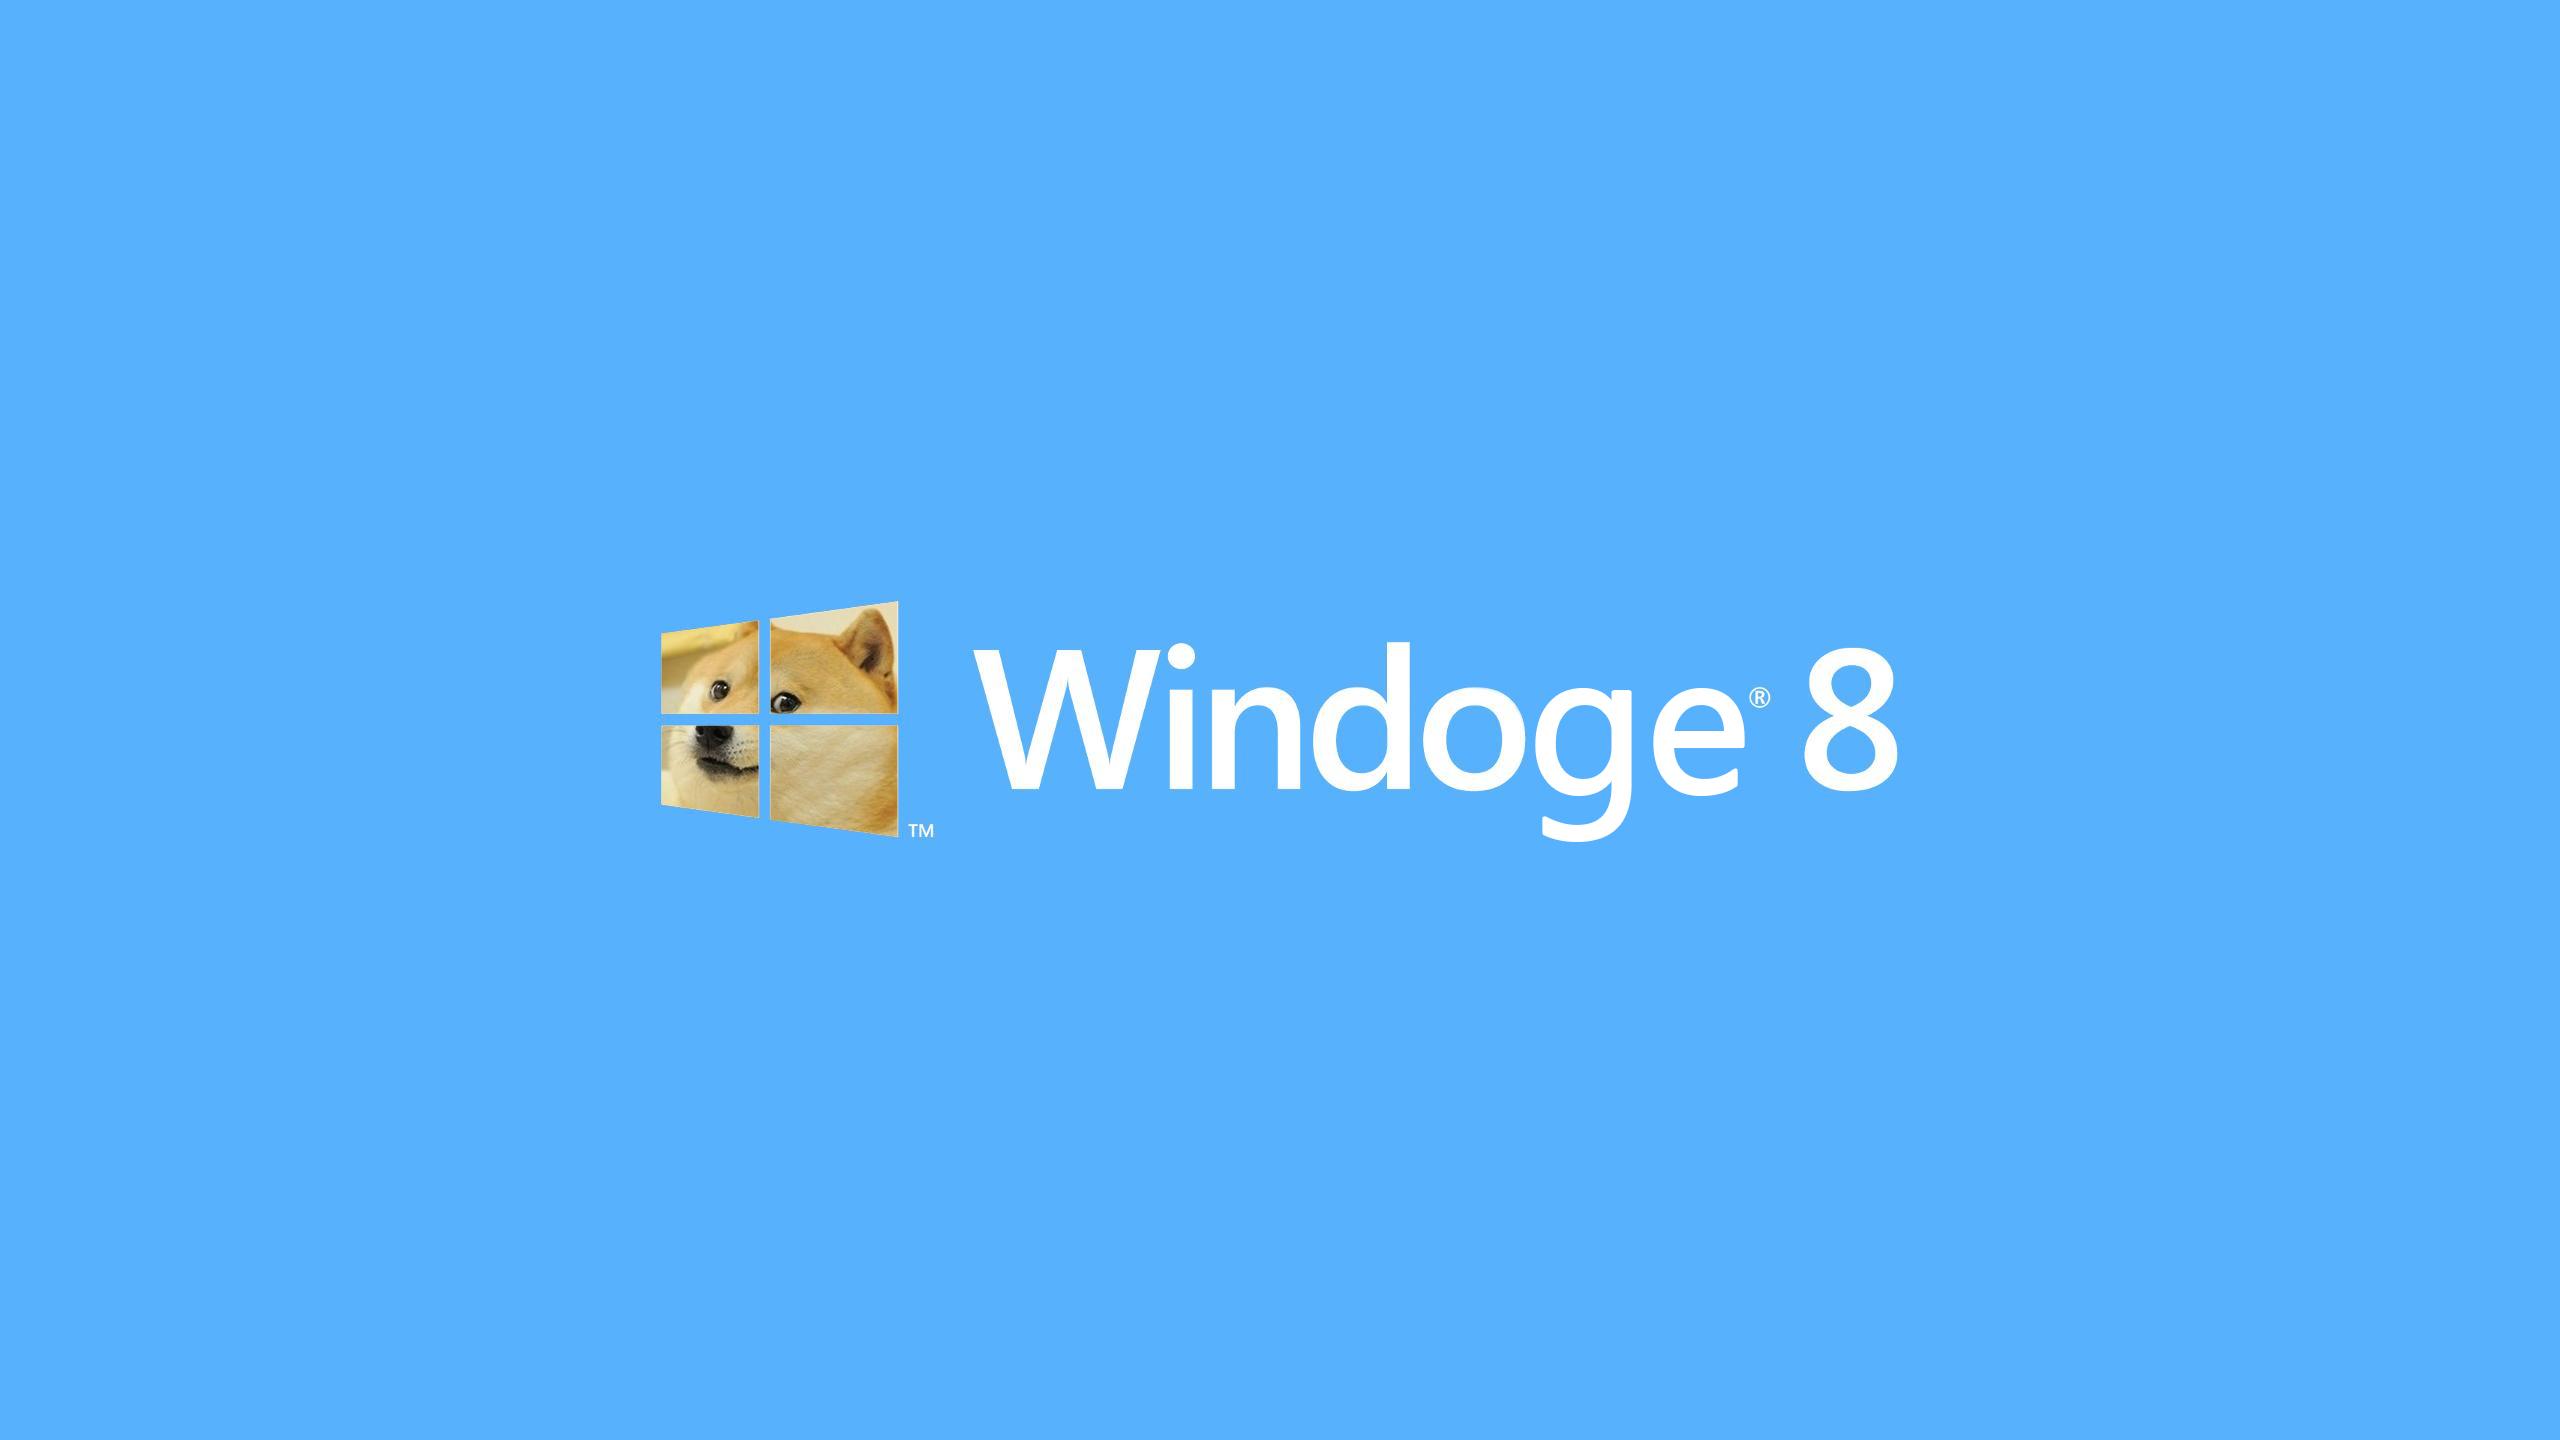 Windoge 8 DOGE Meme Wallpaper 2560x1440